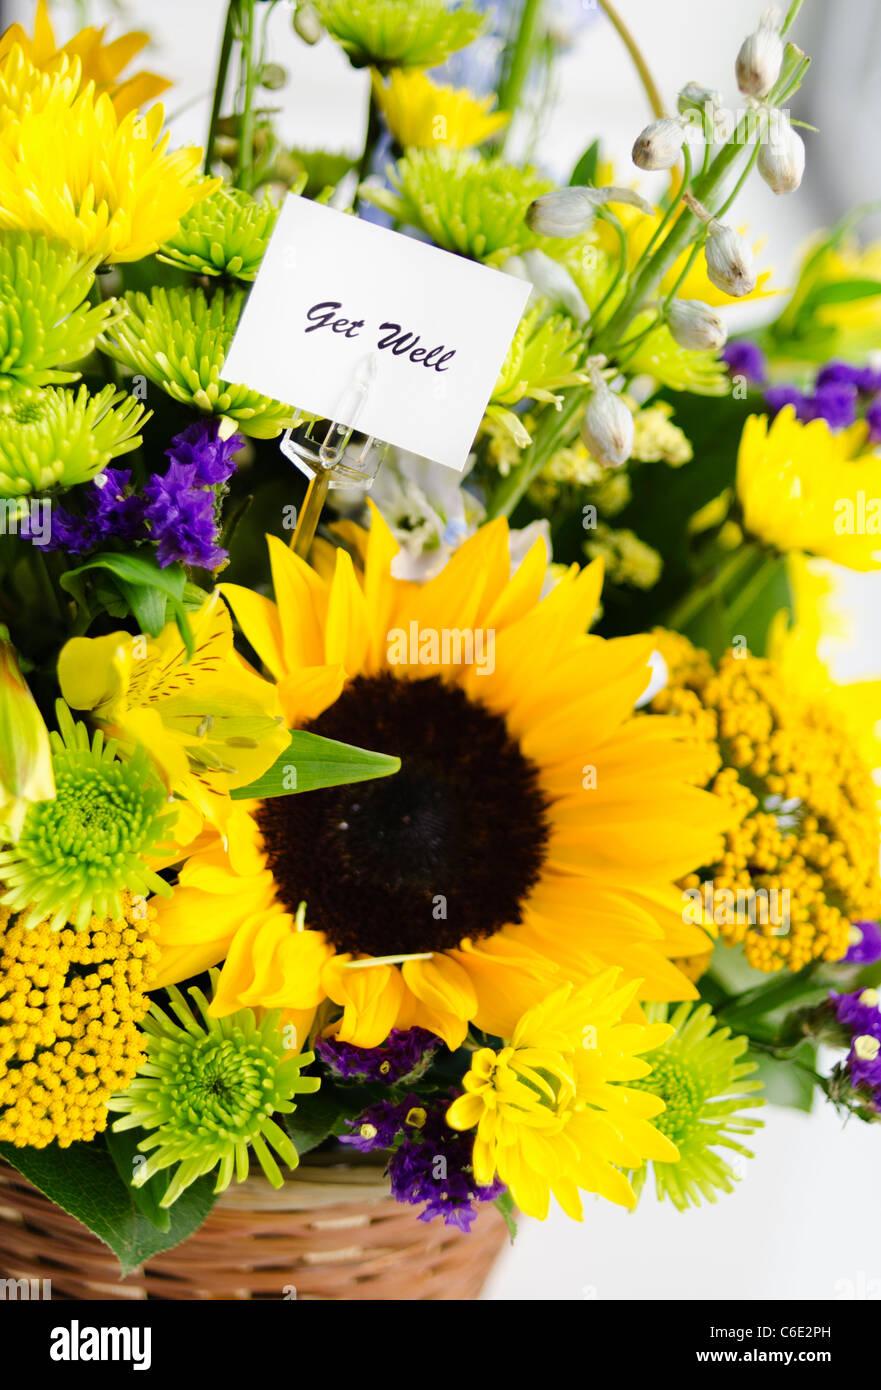 Bouquet de flores con tarjeta Imagen De Stock